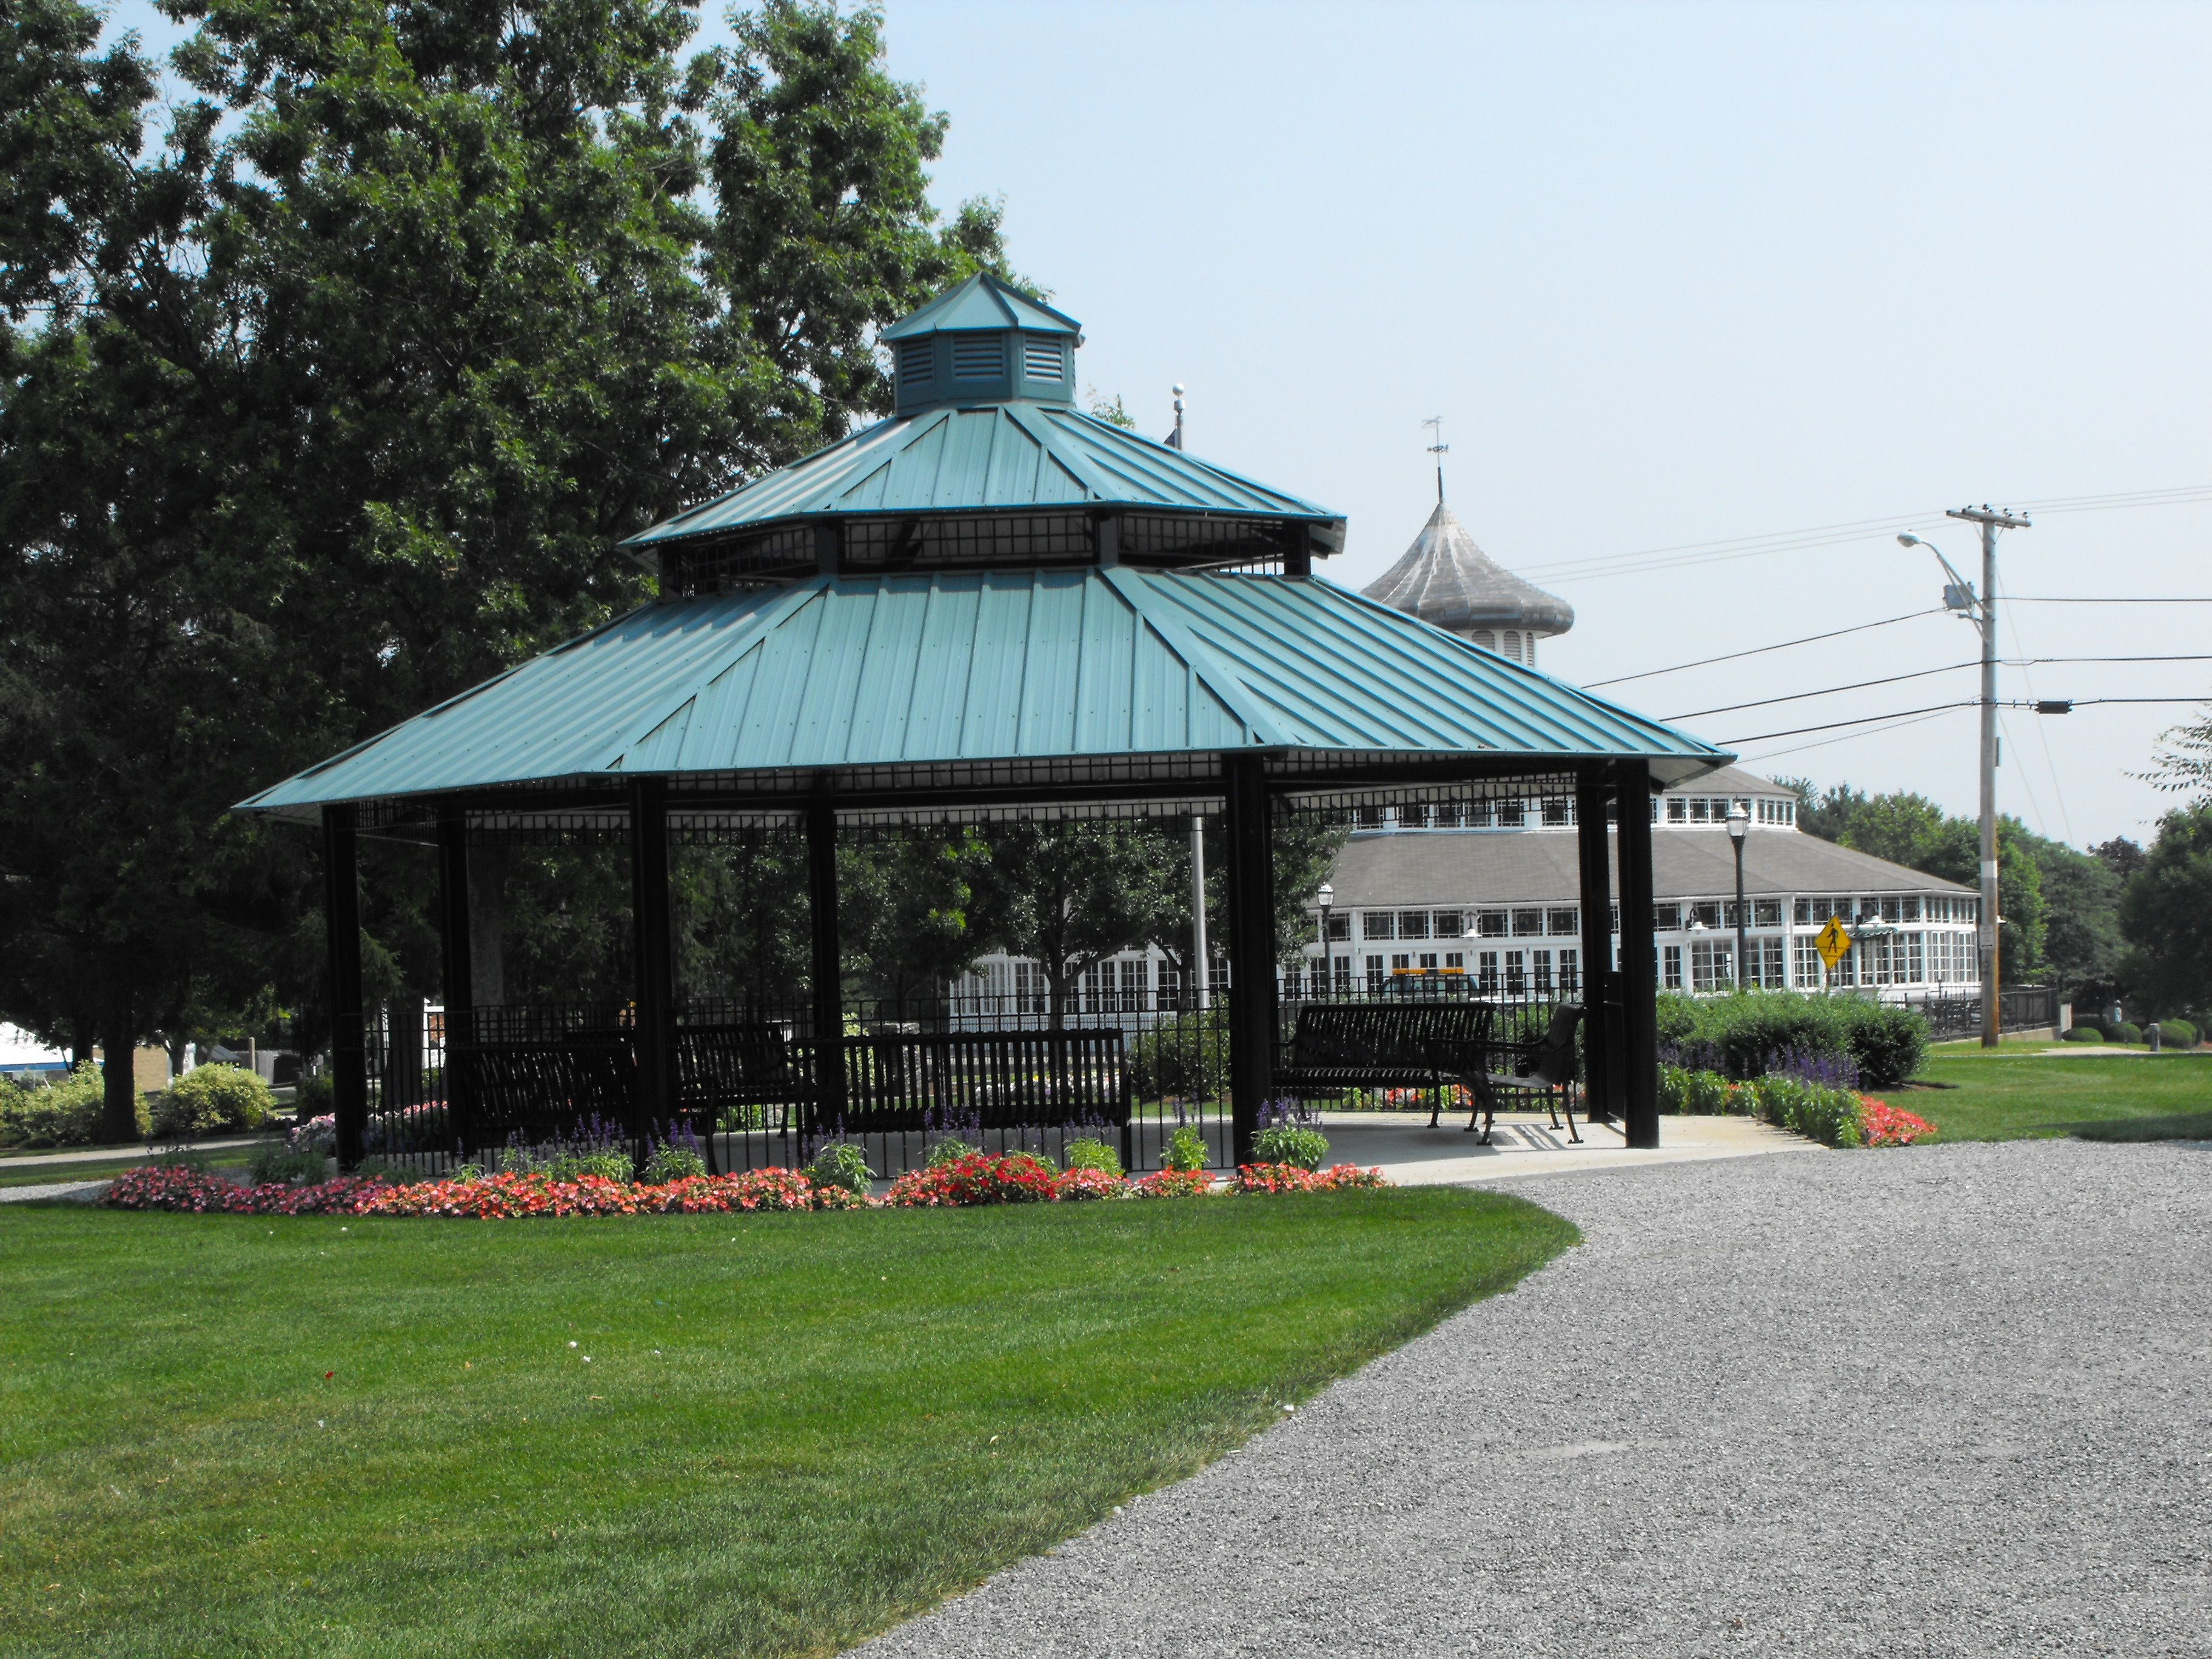 Larissa Park, and the Crescent Park Carousel, Riverside RI